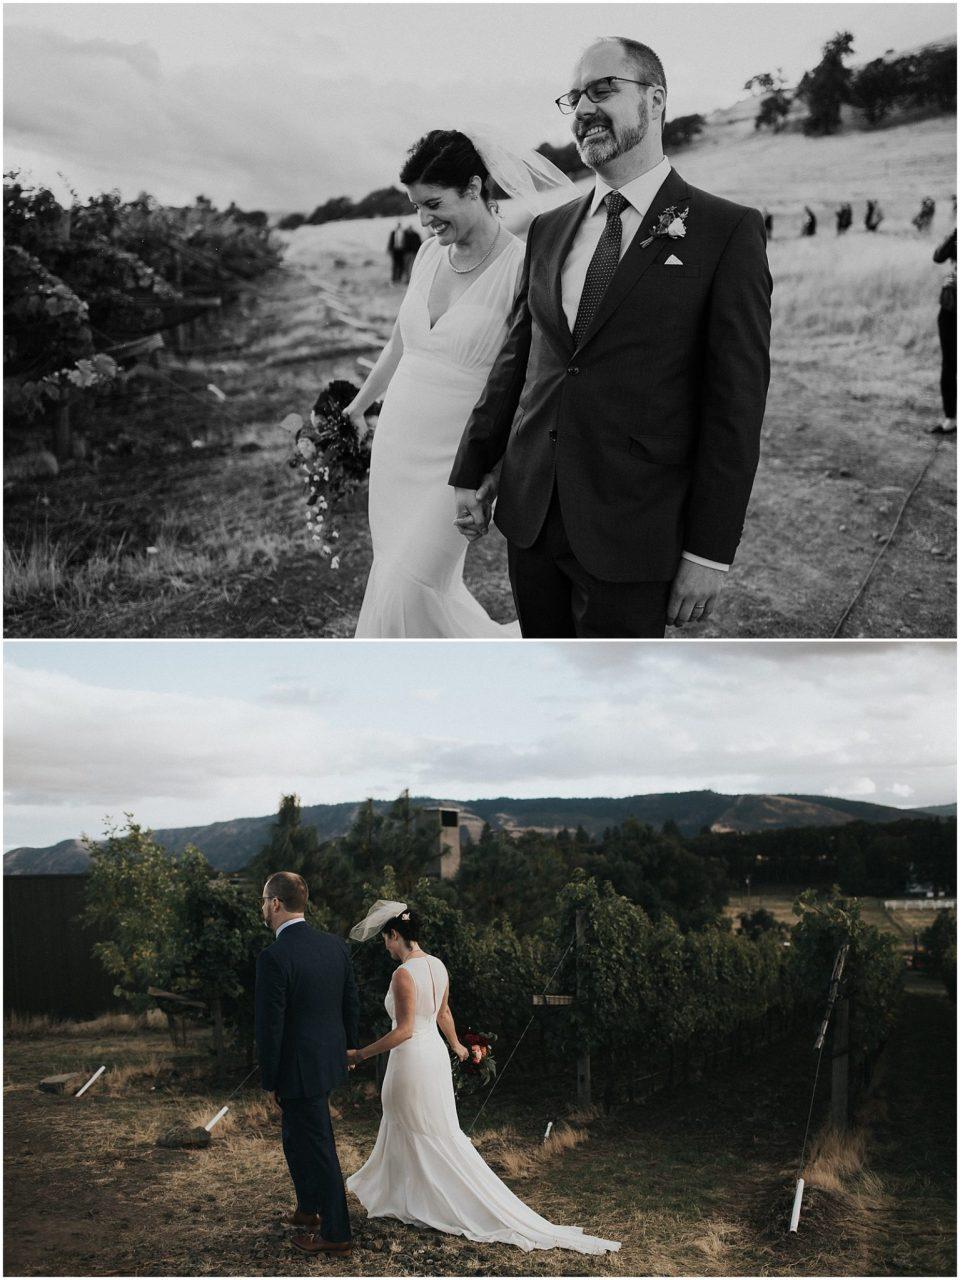 benjamin-colleen-corcellars-wedding (45 of 74)_seattle wedding.jpg